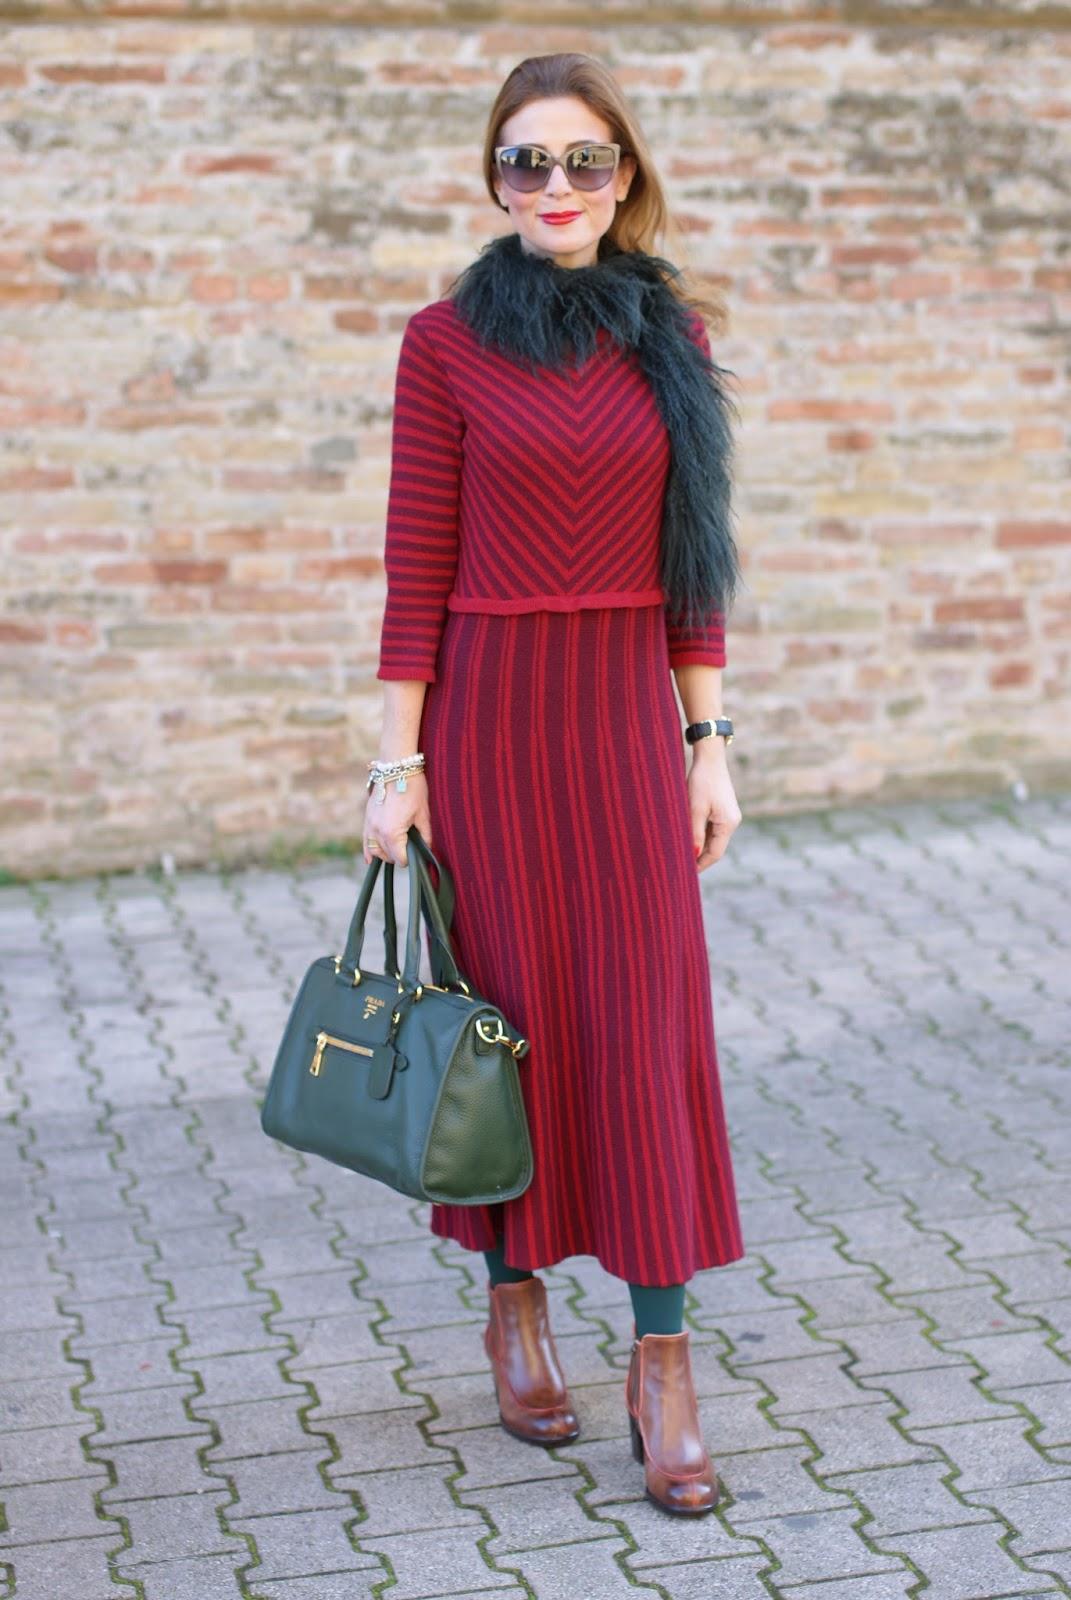 Fashion or vintage or interesting